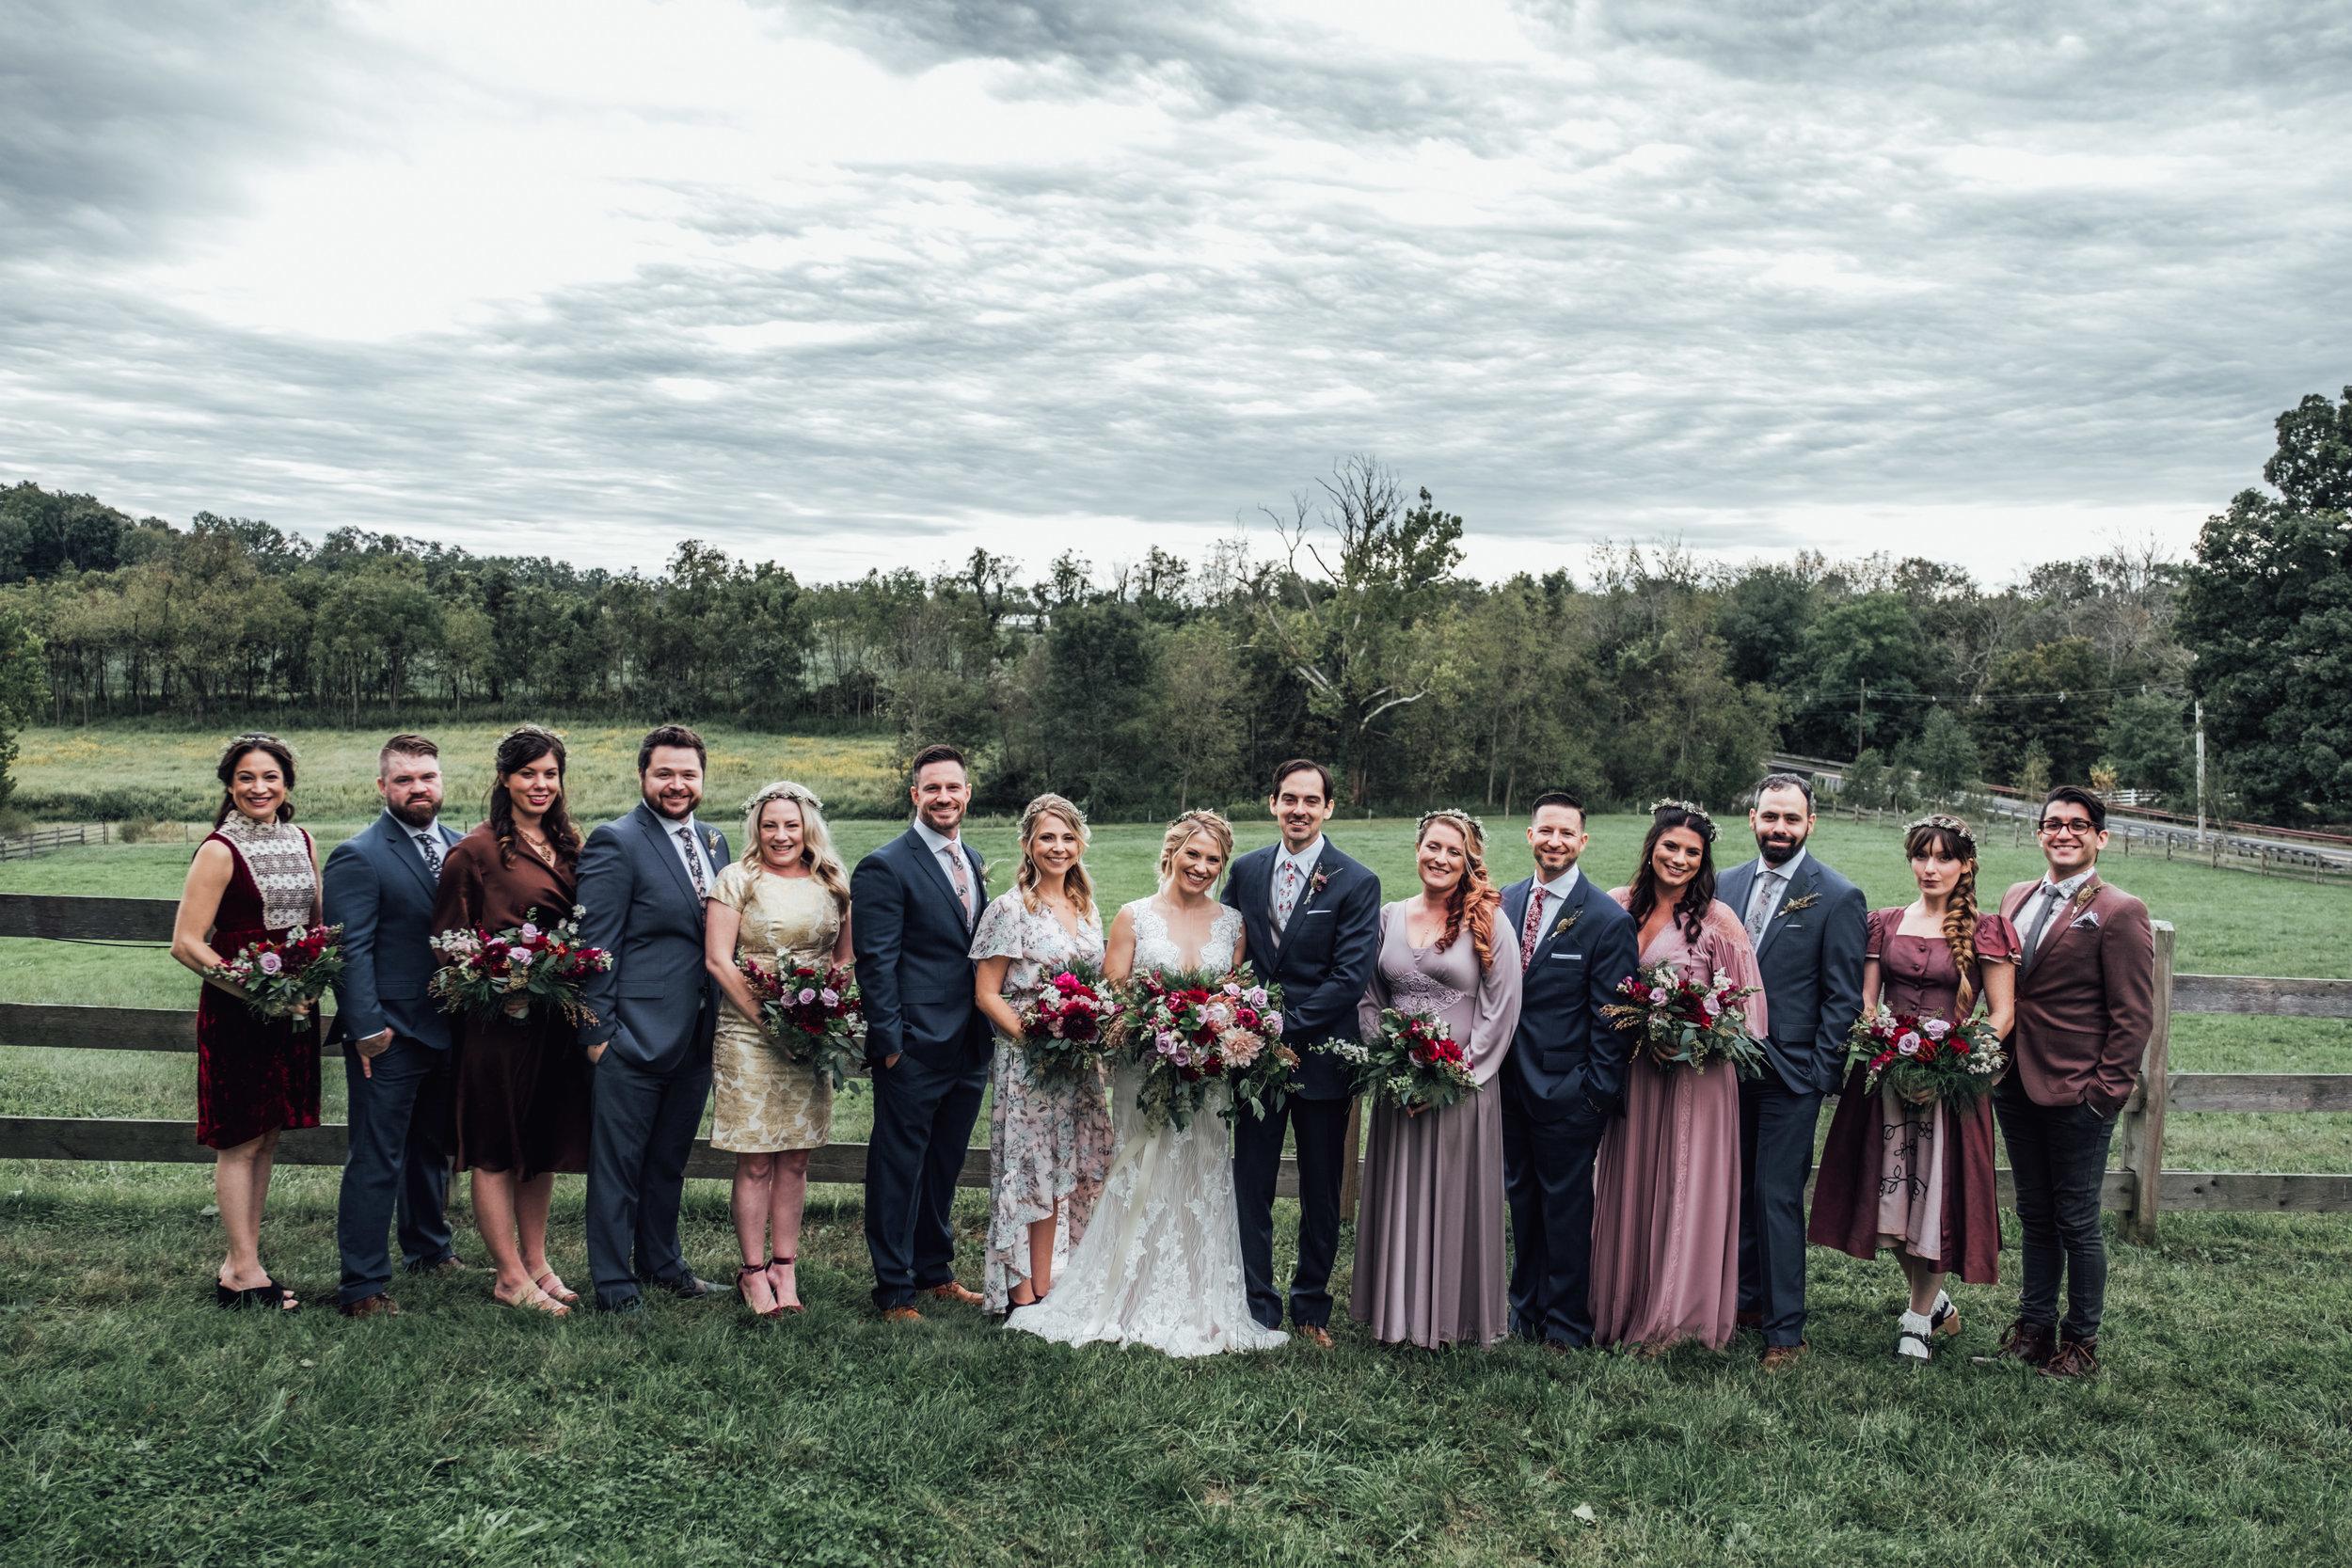 Allyson-Steve-Wedding-Portraits-174.jpg